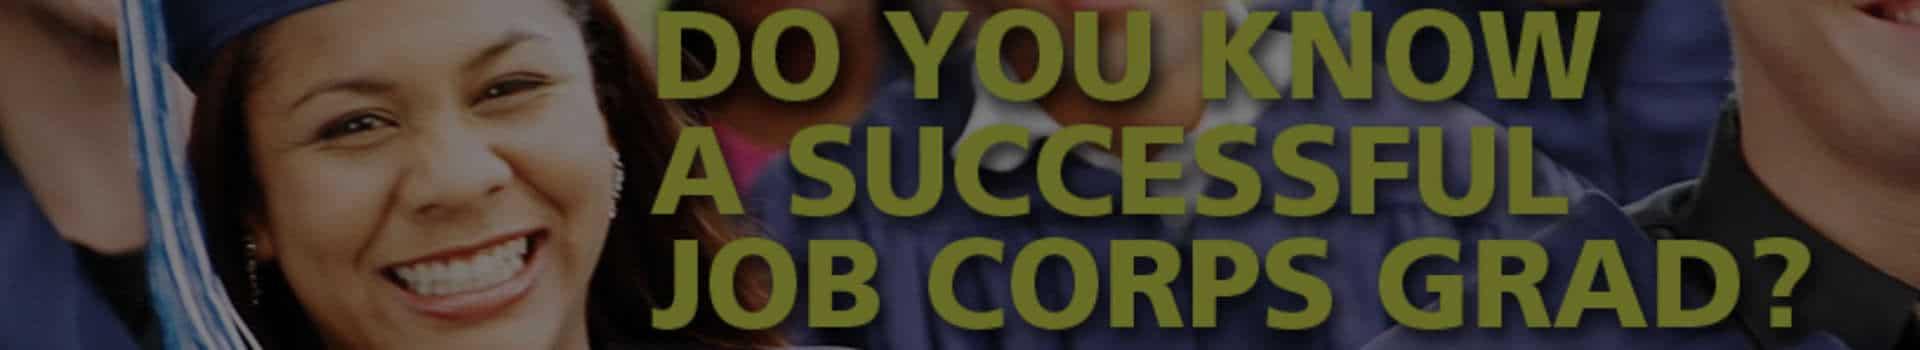 Job Corps Materials Marketplace Portfolio